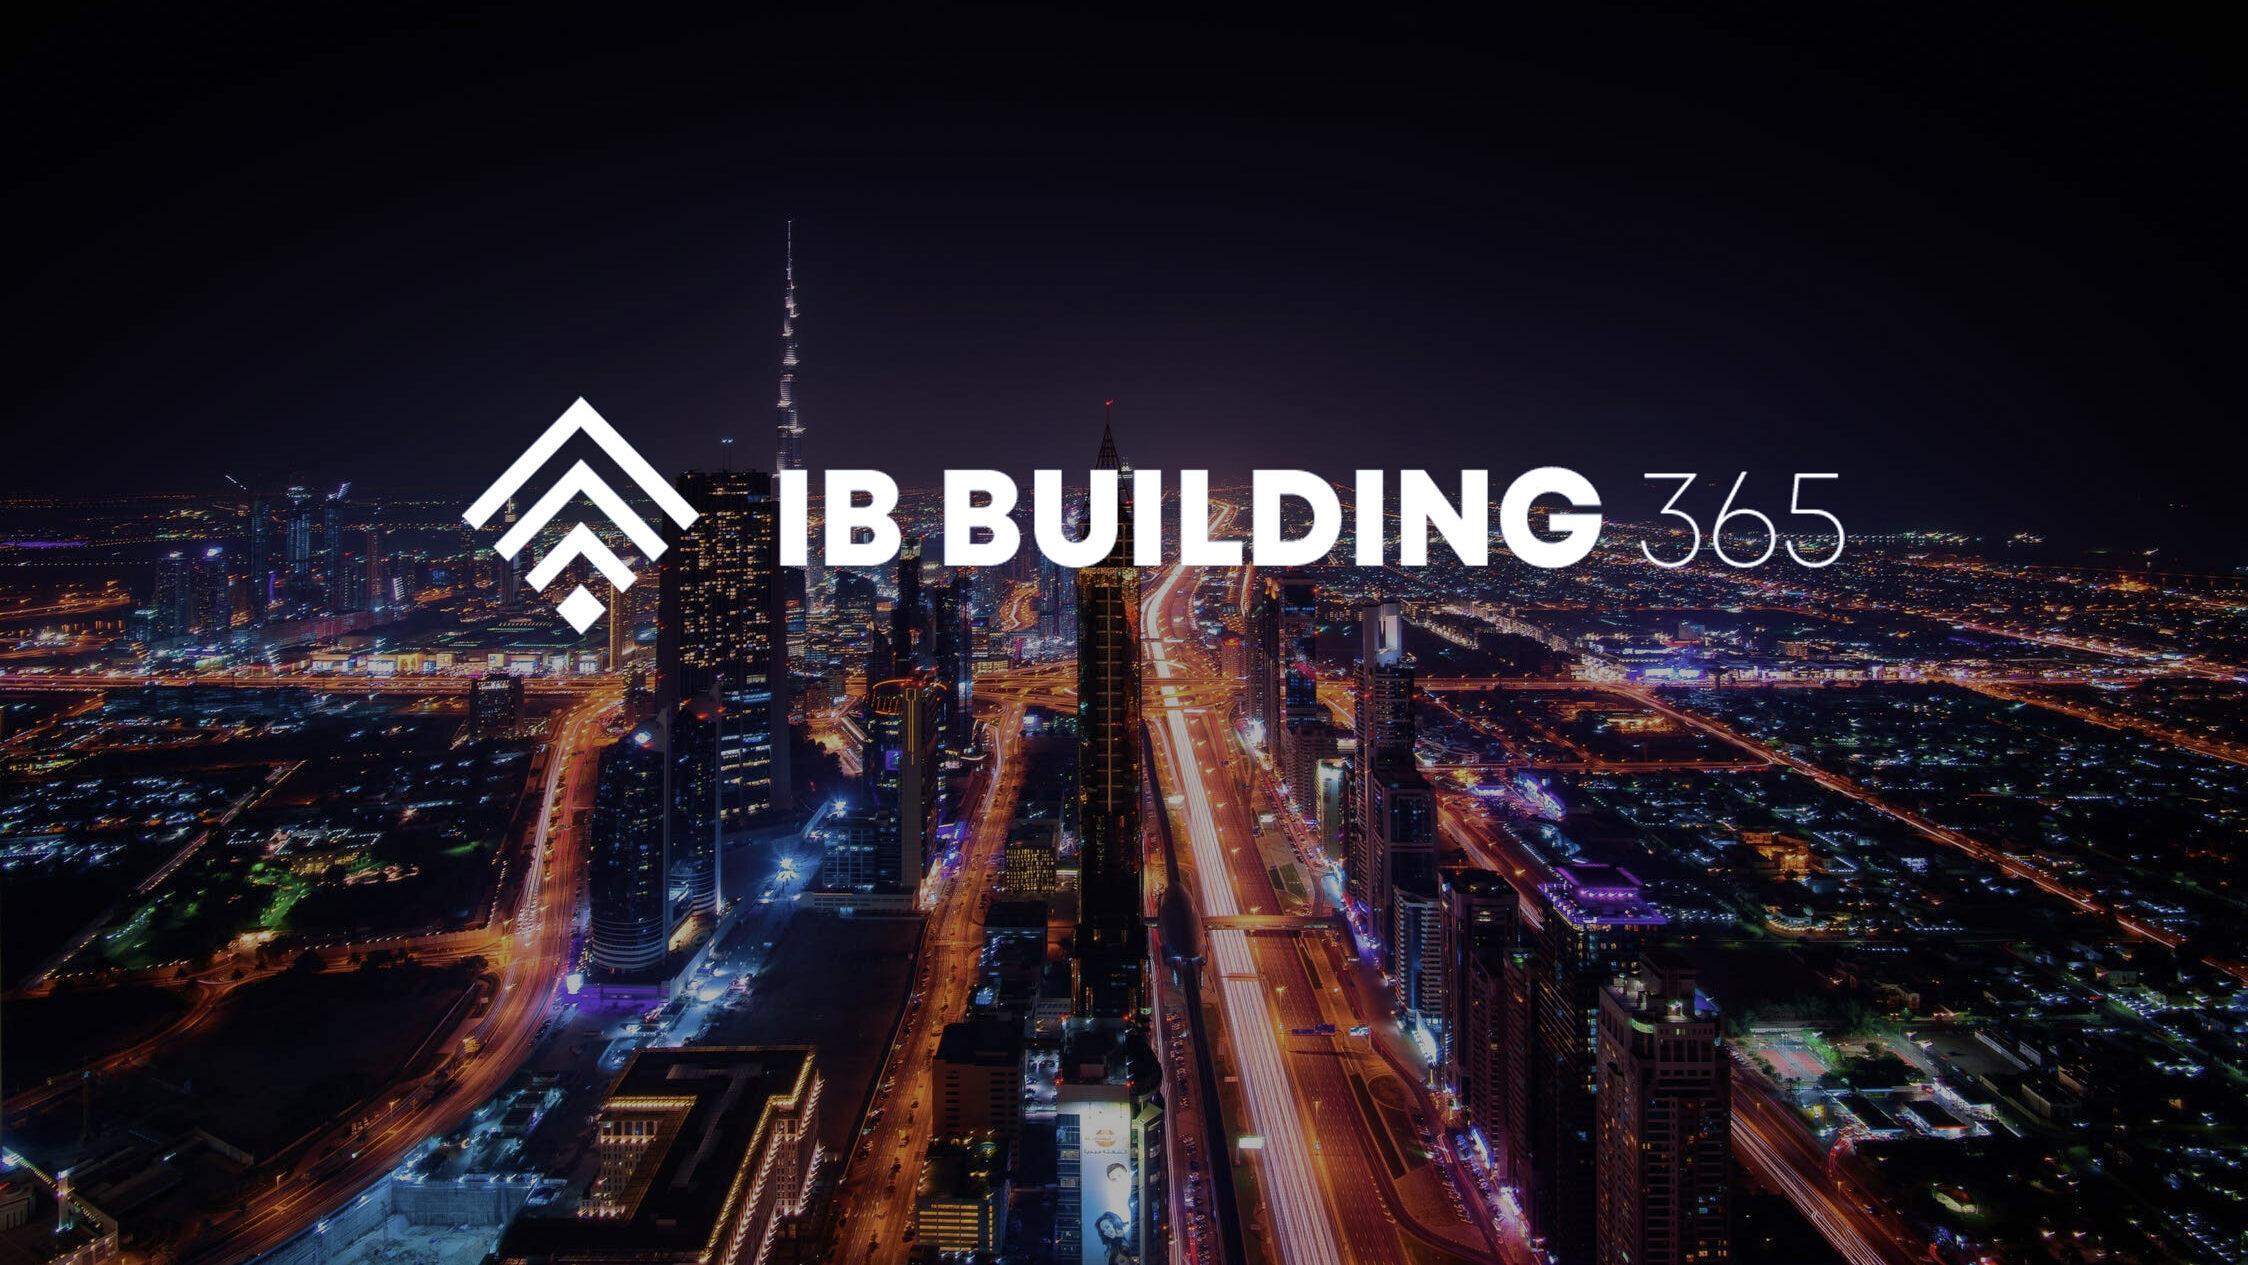 IB Building 365 para Microsoft Dynamics 365 Business Central